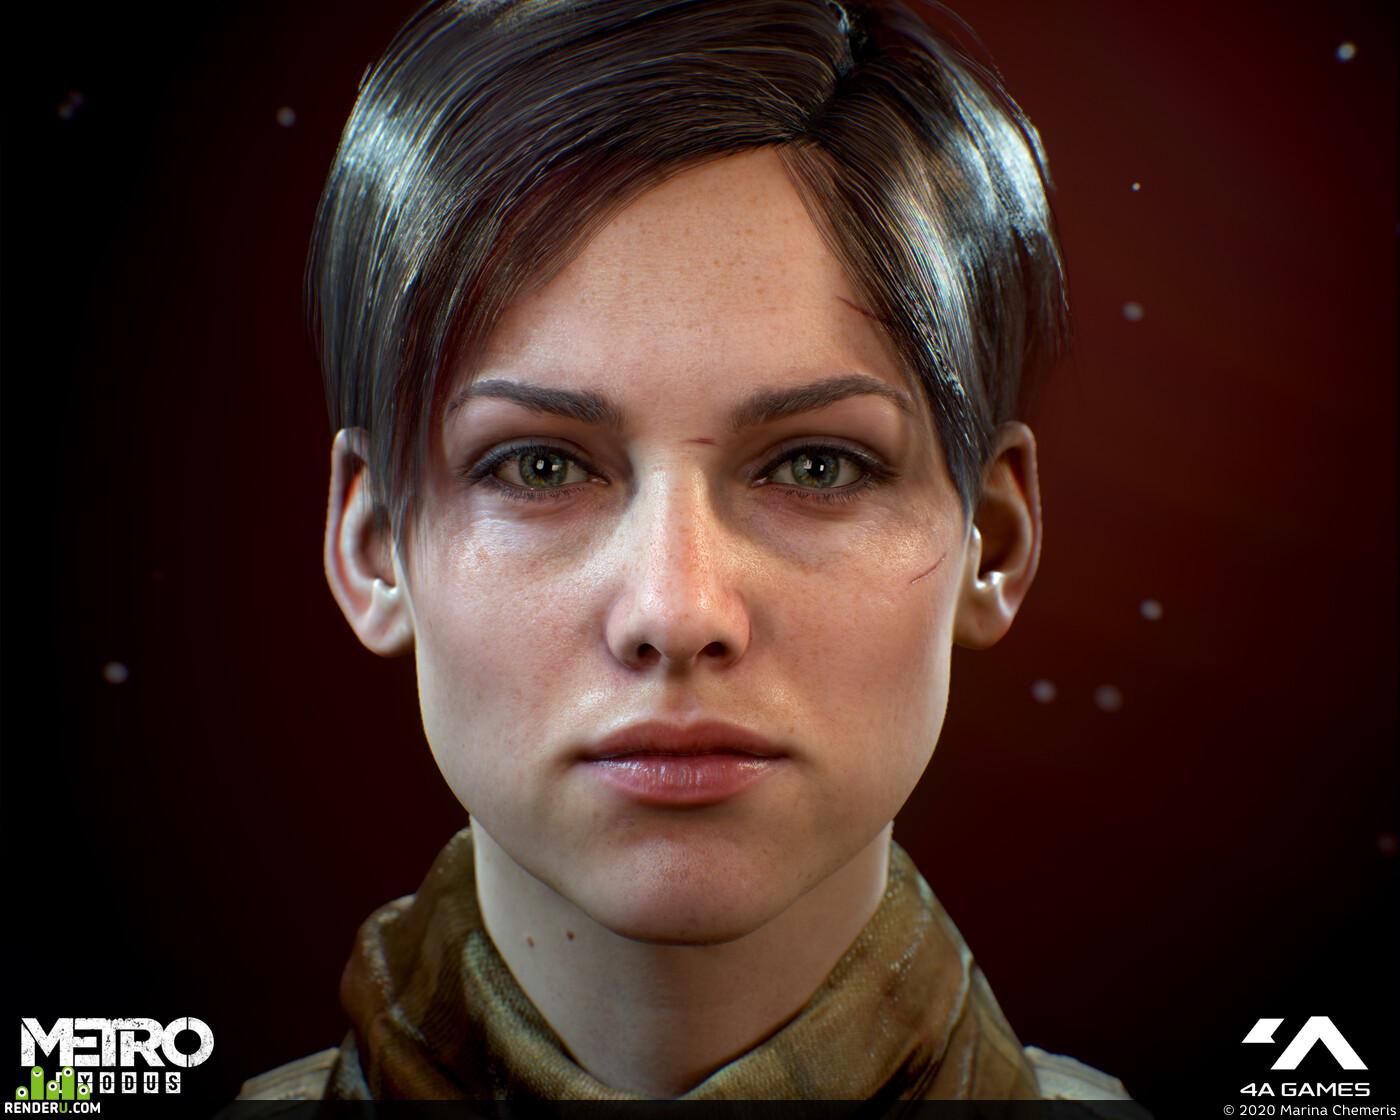 3d, Characters, game character, characterart, characterdesign, female character, head, head art, female face, Metro exodus